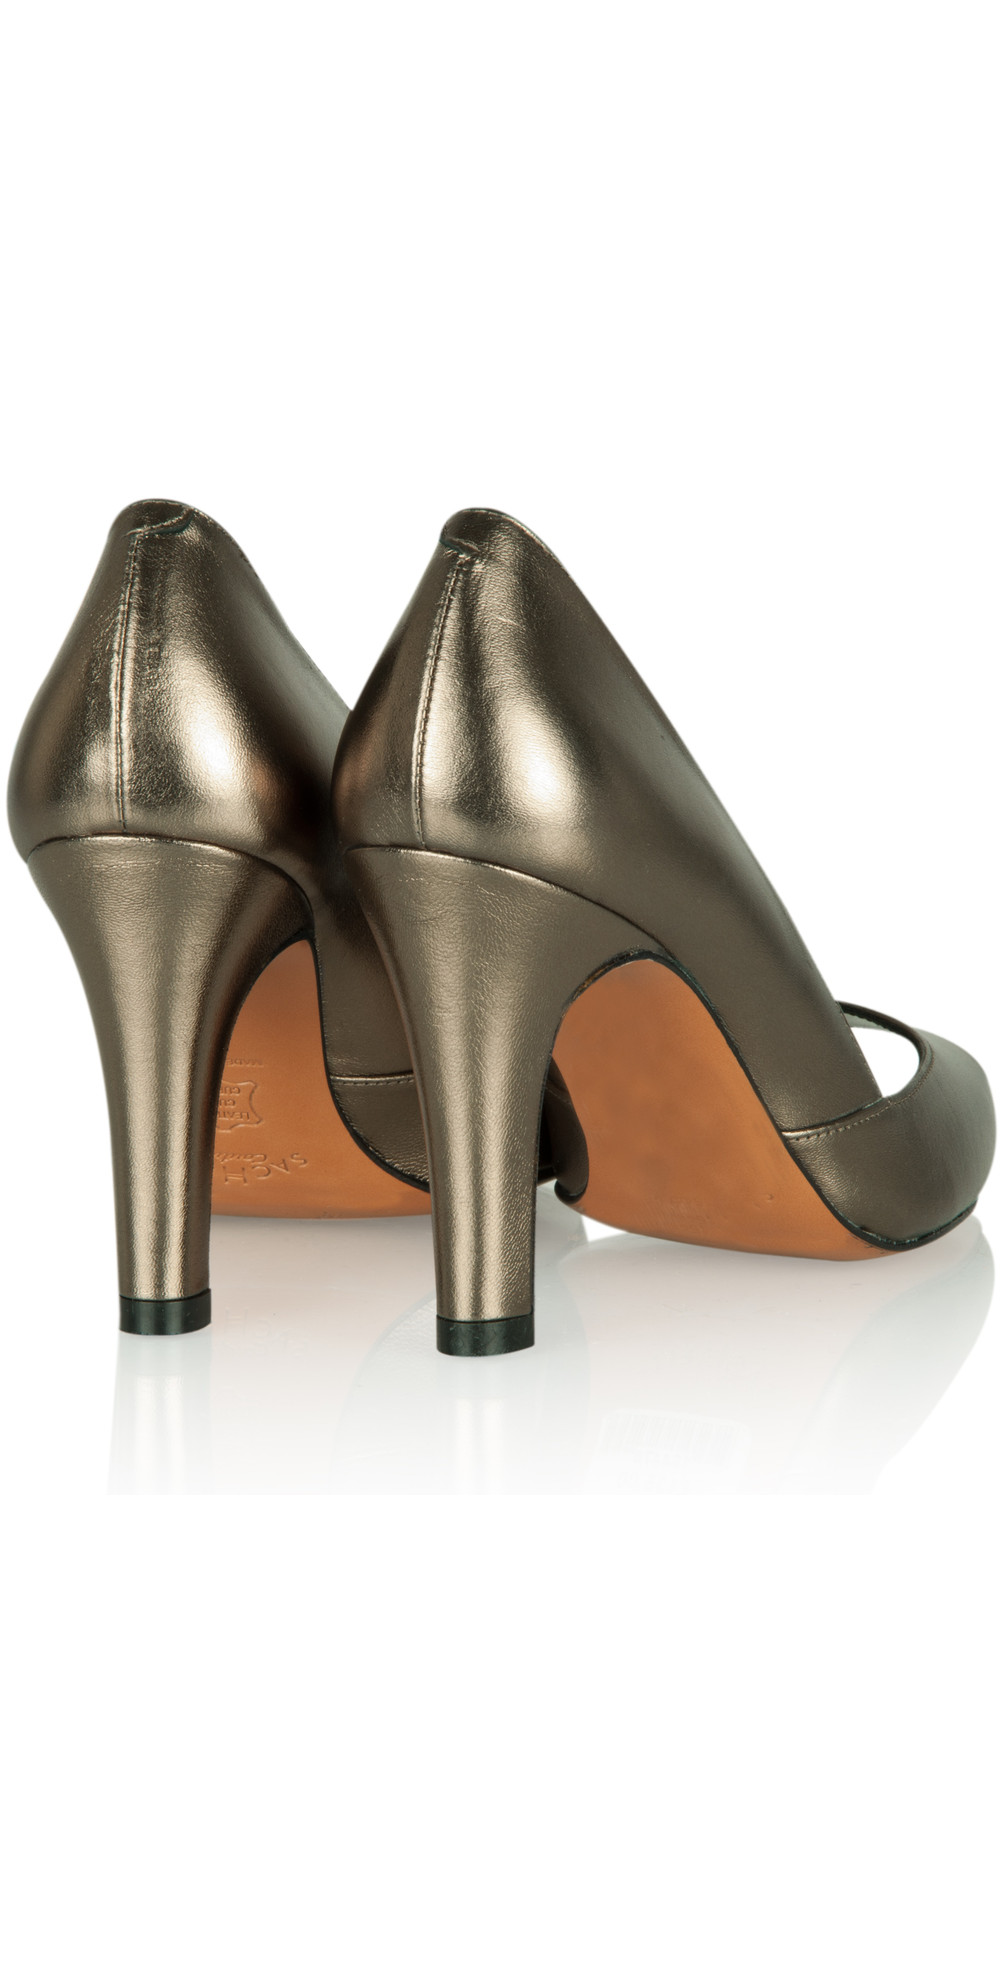 Margarita Hh Shoe main image